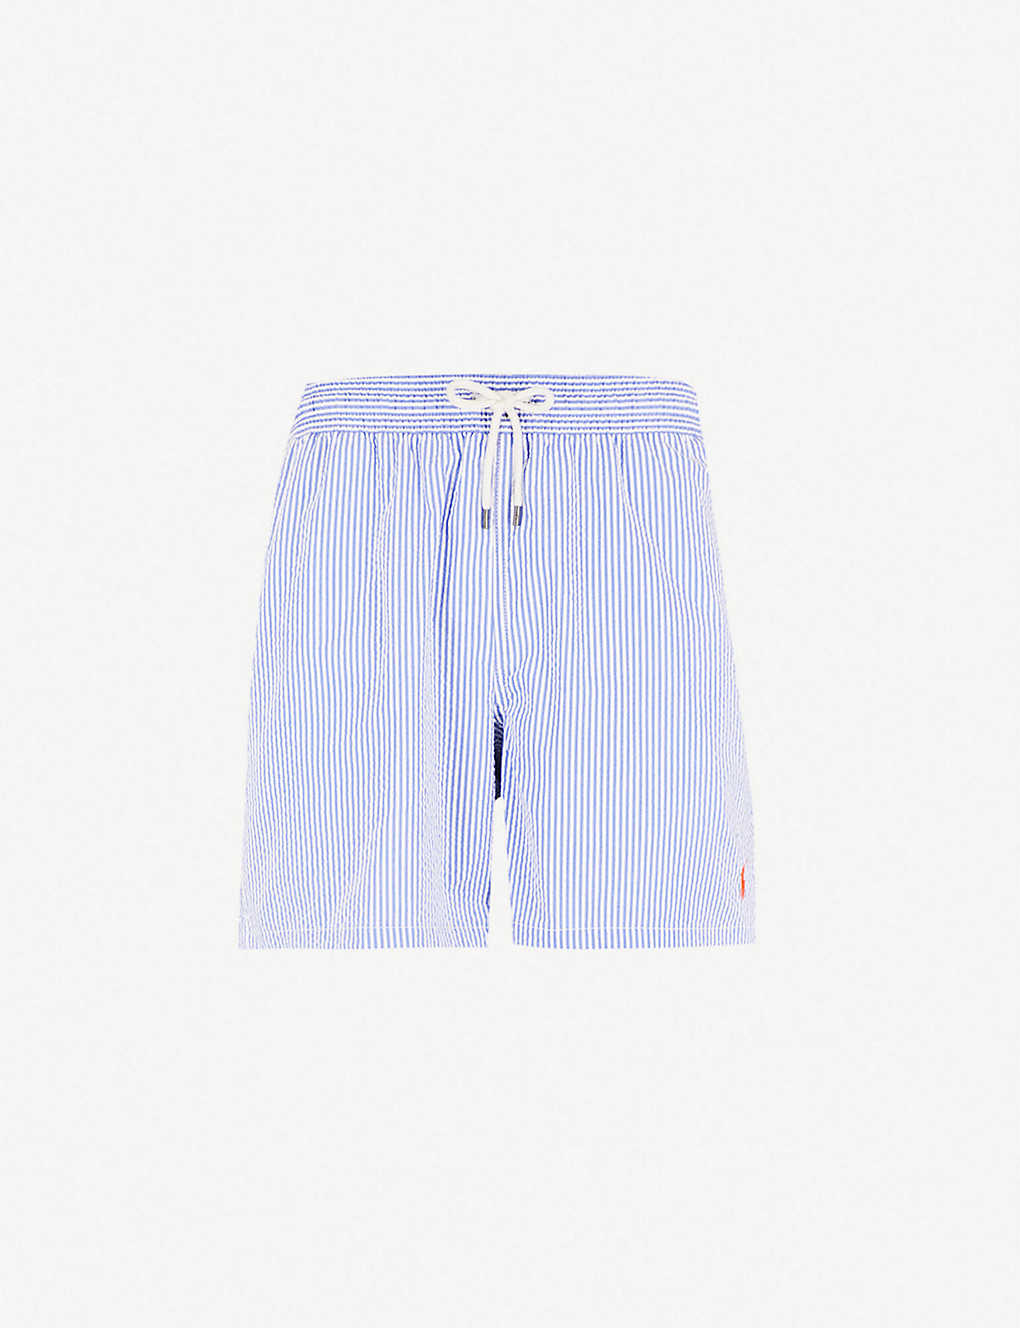 80b821fcfe98 POLO RALPH LAUREN - Traveller striped cotton-blend swim shorts ...